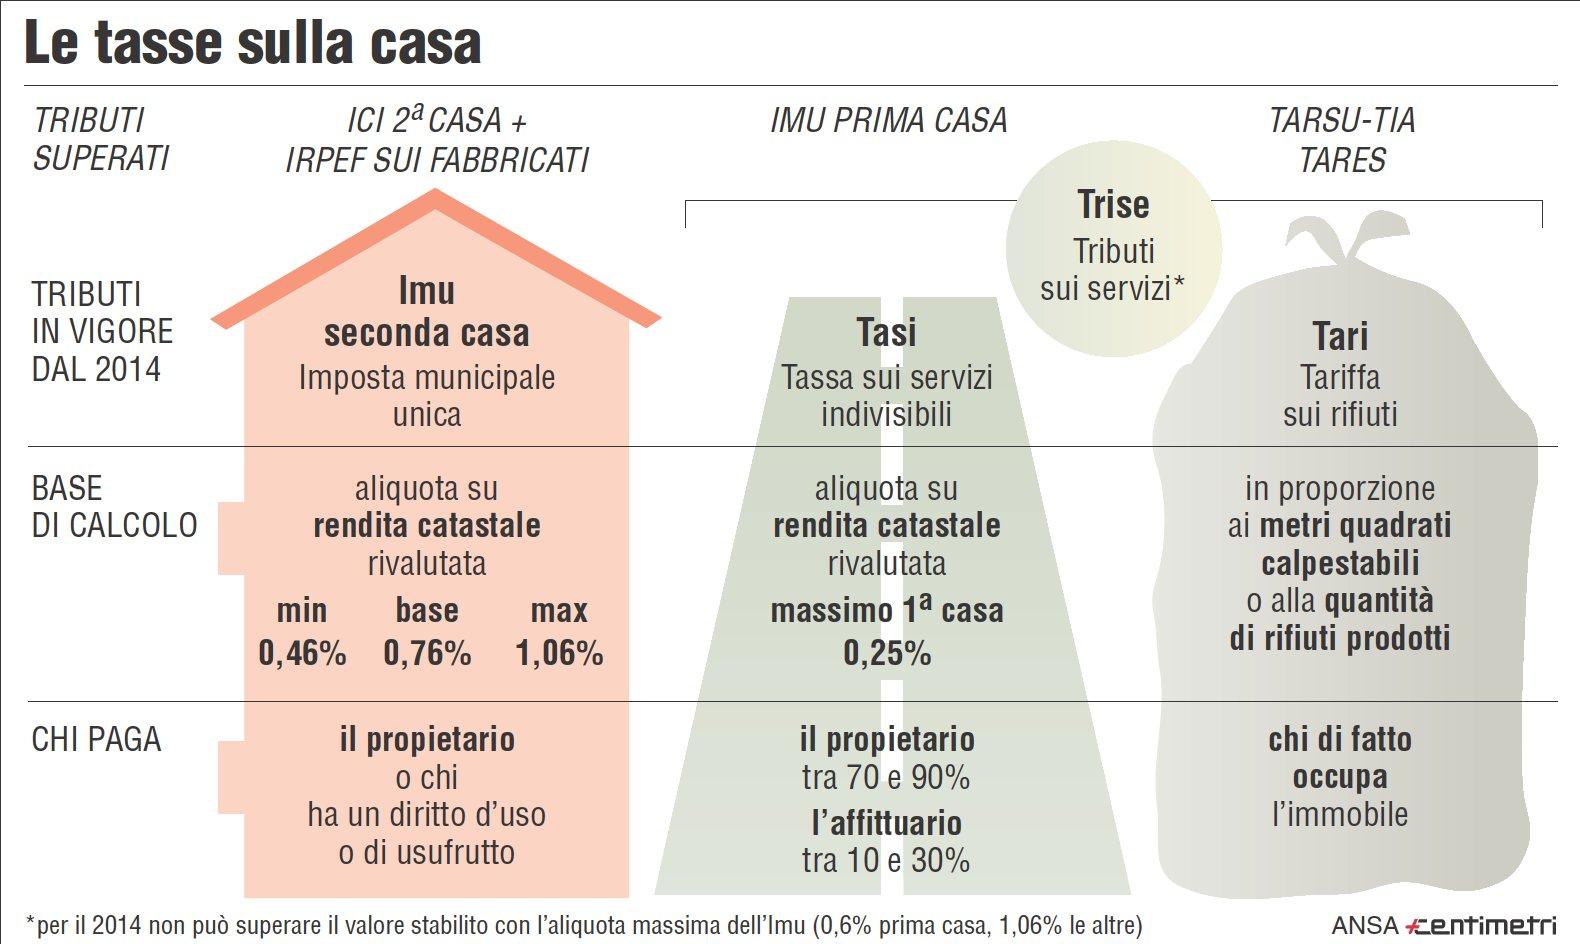 Casa moderna roma italy quanto si paga di imu - Tari seconda casa disabitata ...